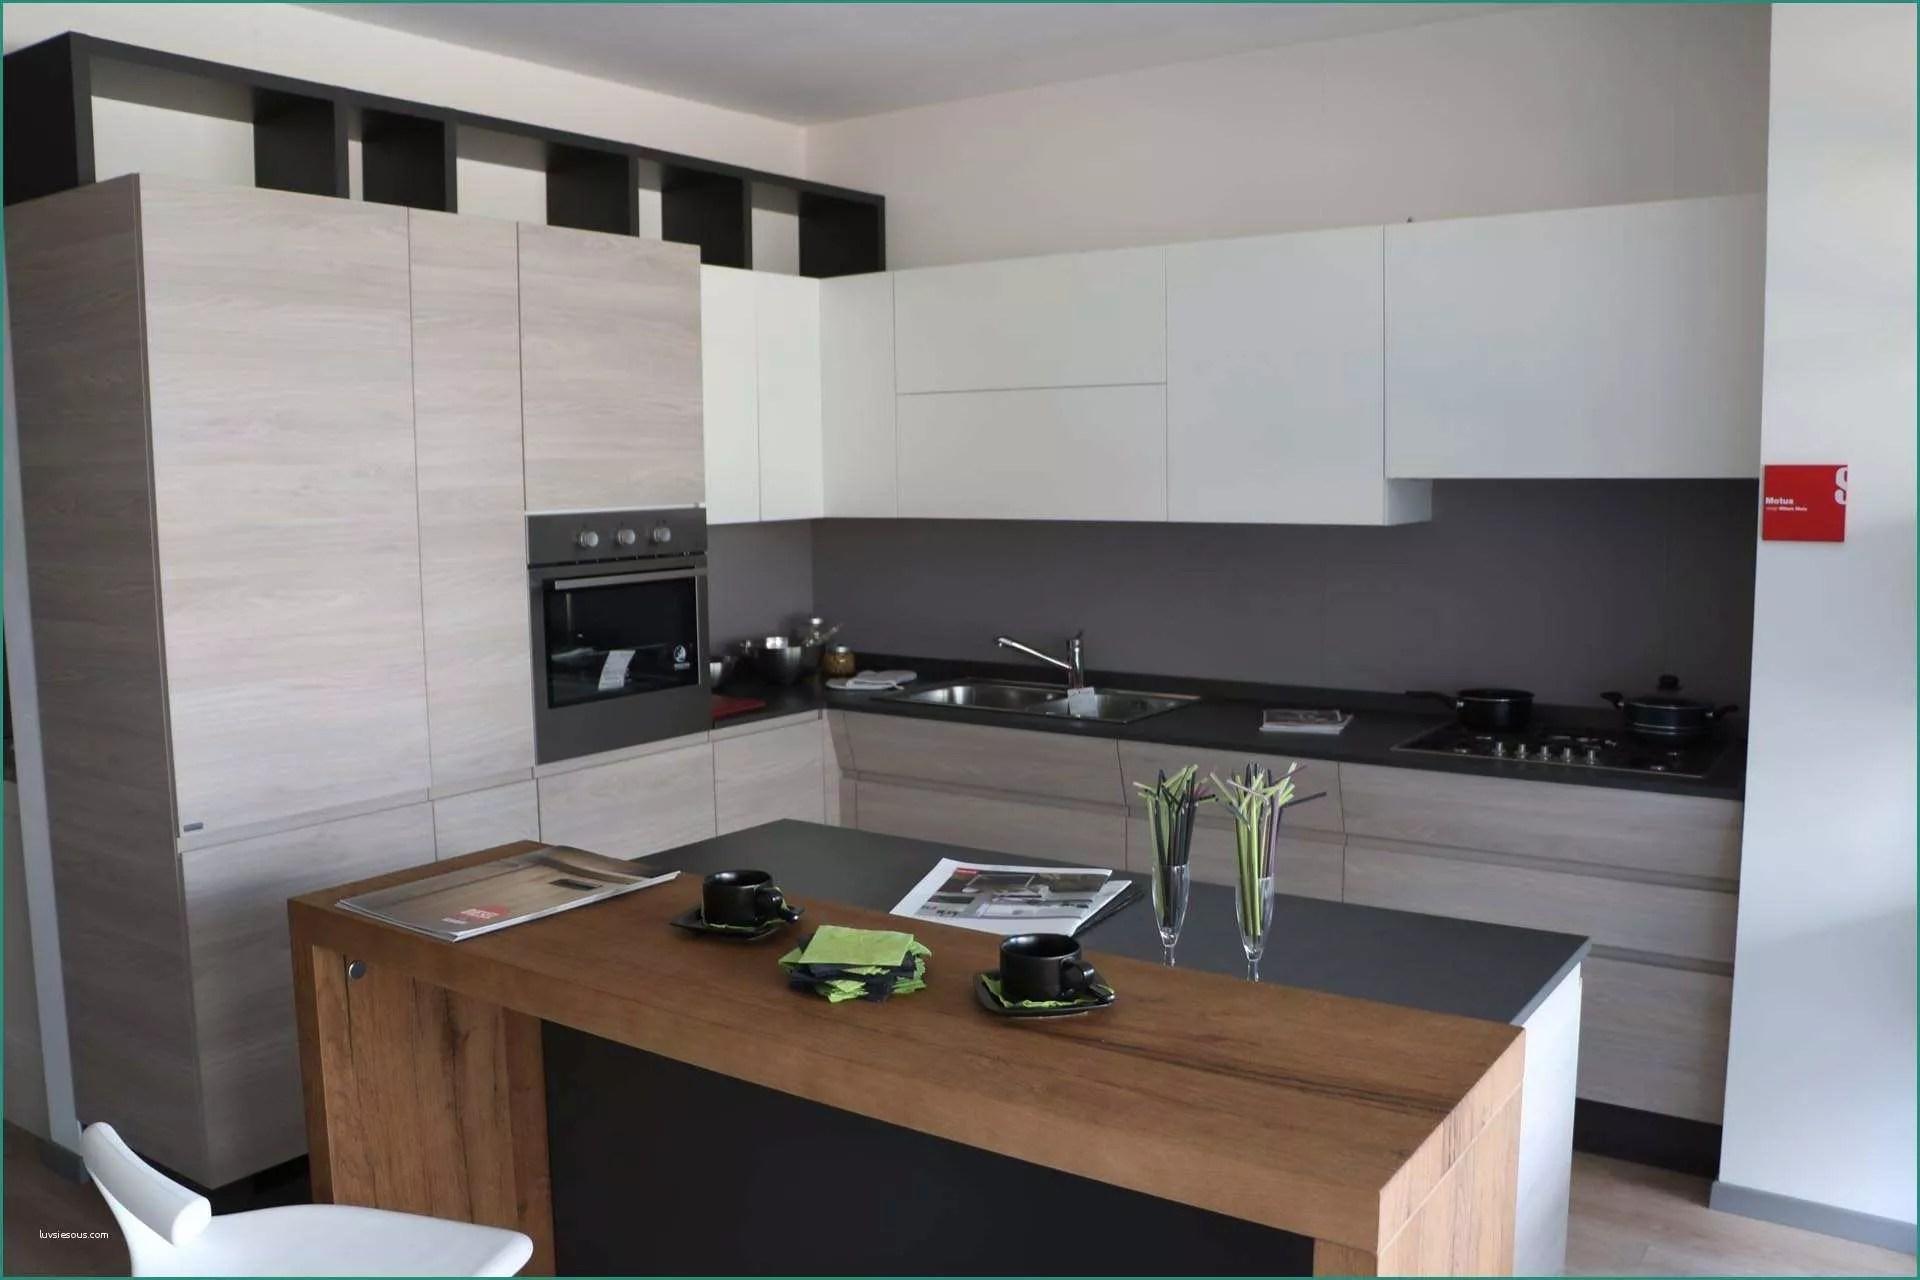 Cucina Angolo Mansarda | Cucine Angolari Moderne 30 Nuovo Cucina Per ...